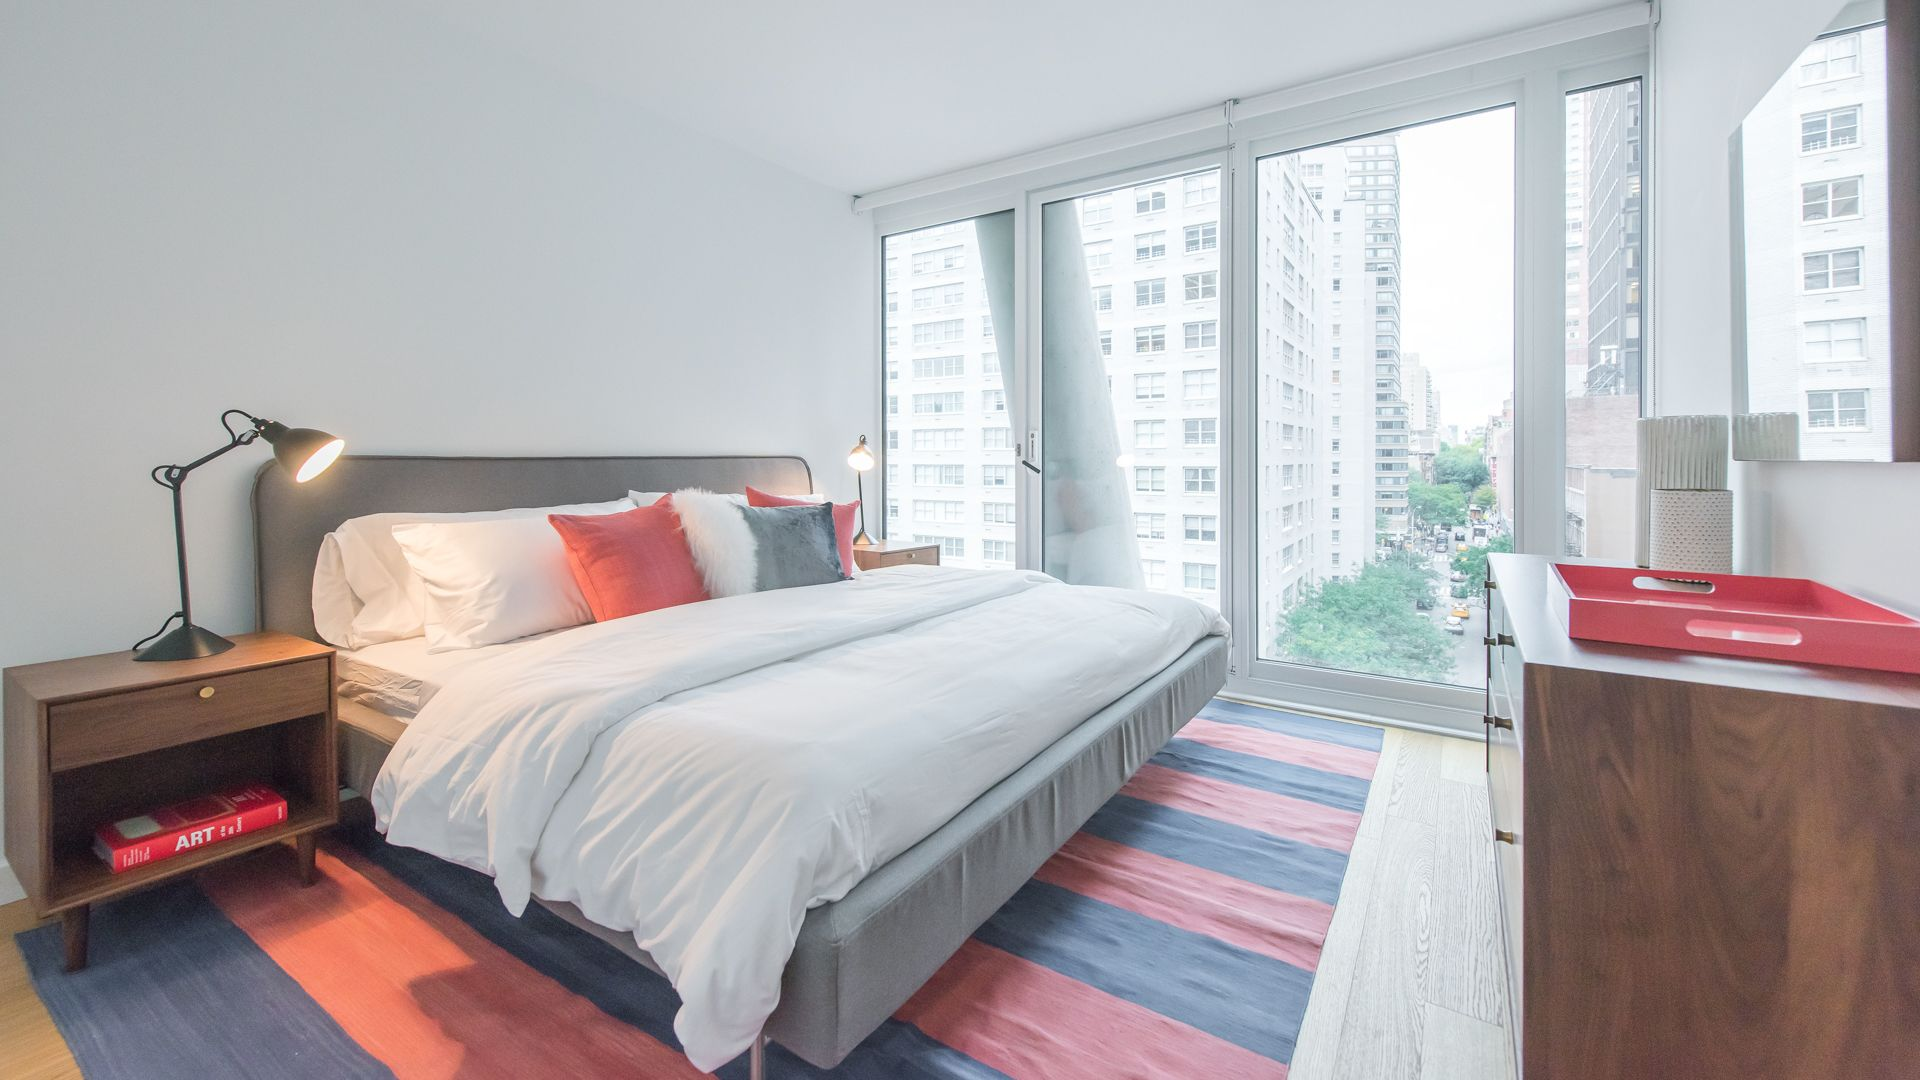 170 Amsterdam Apartments - Bedroom